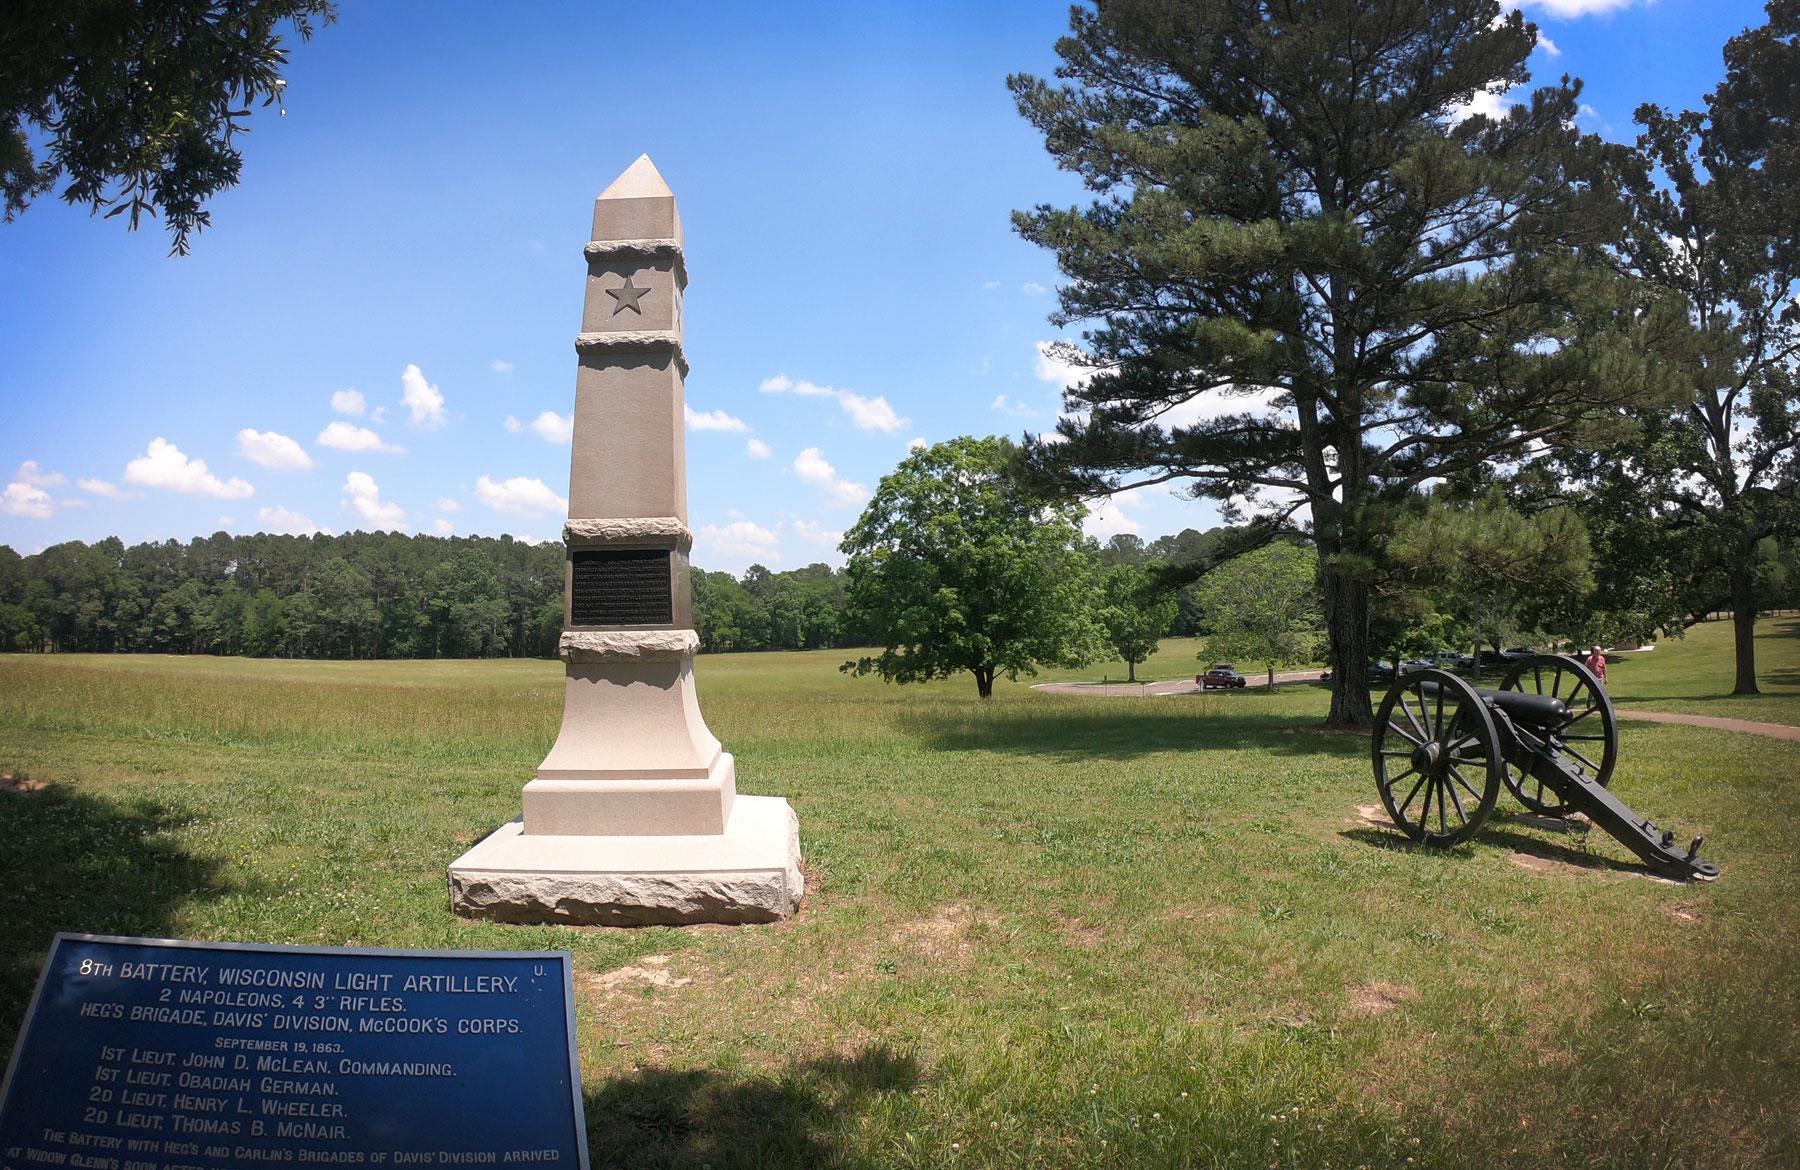 Monument at Chickamauga Battlefield National Military Park, Georgia